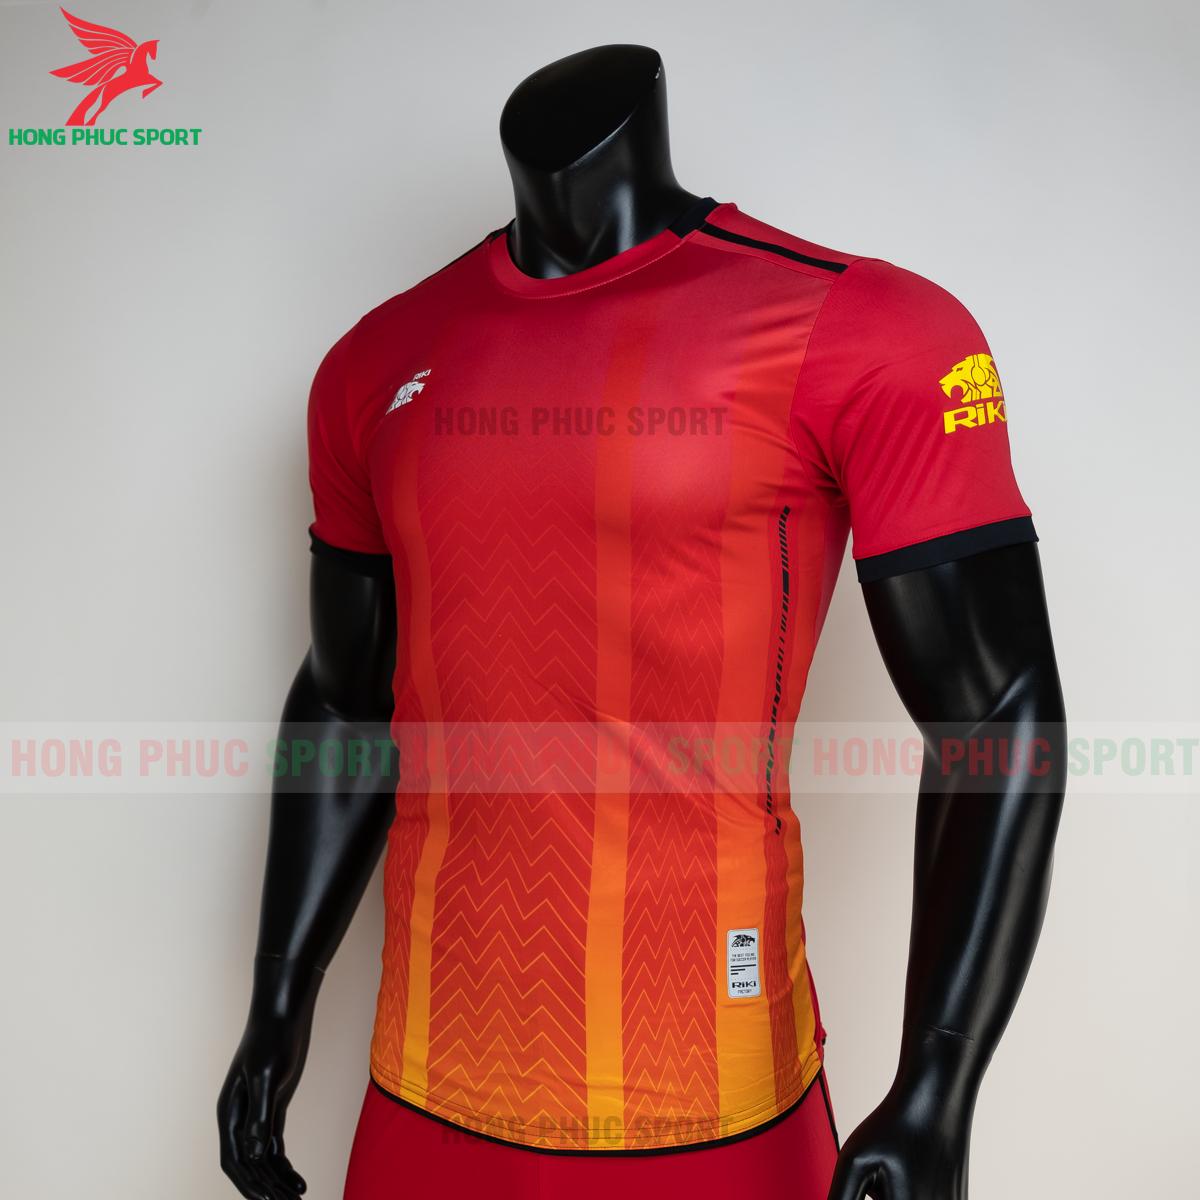 https://cdn.hongphucsport.com/unsafe/s4.shopbay.vn/files/285/ao-bong-da-khong-logo-riki-furior-mau-do-3-605013a7b5a05.png